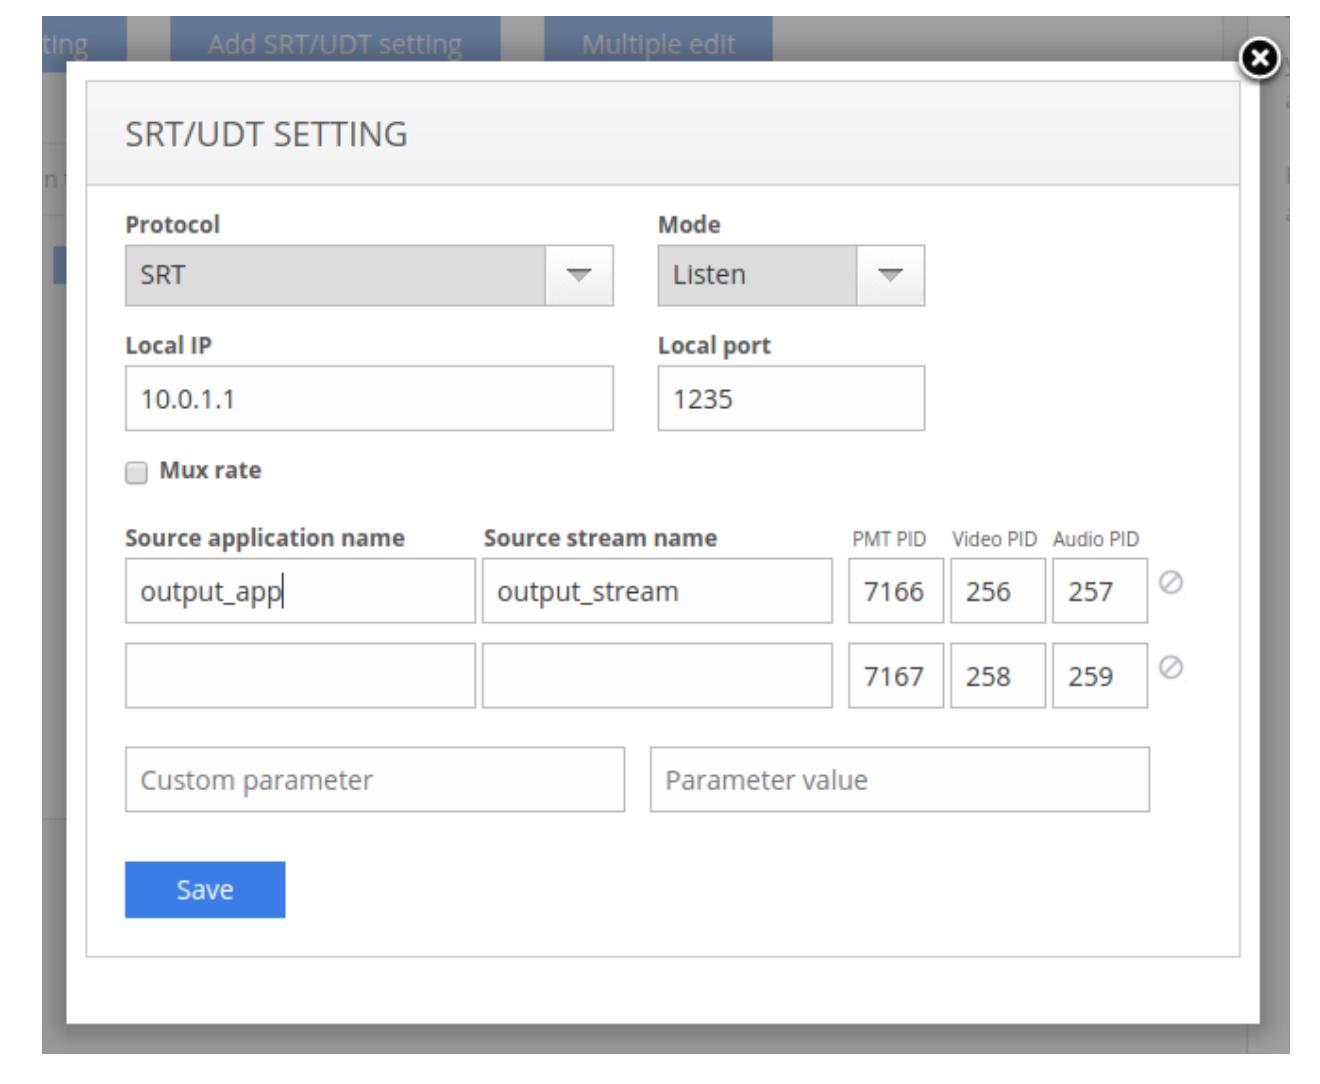 SRT UDT settings